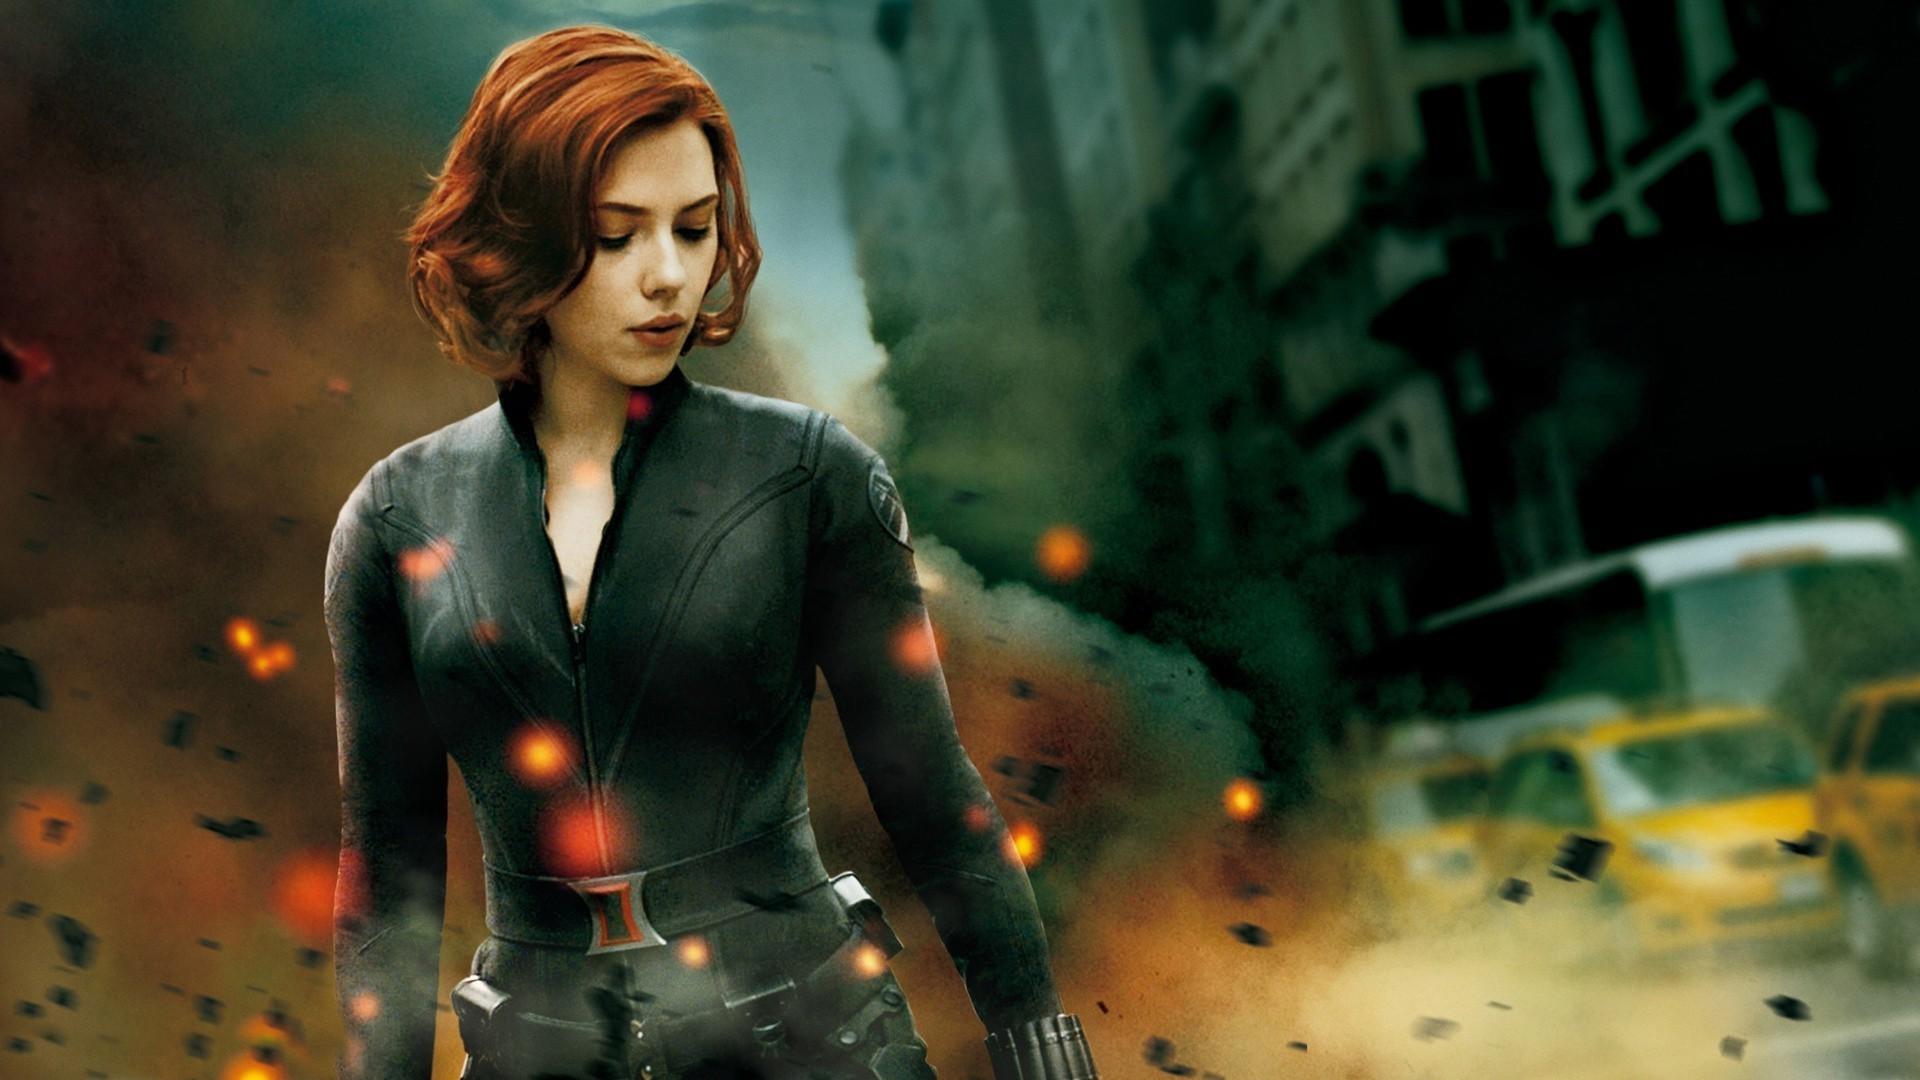 1920x1080 Px Black Widow Marvel Comics Scarlett Johansson Superheroines The Avengers